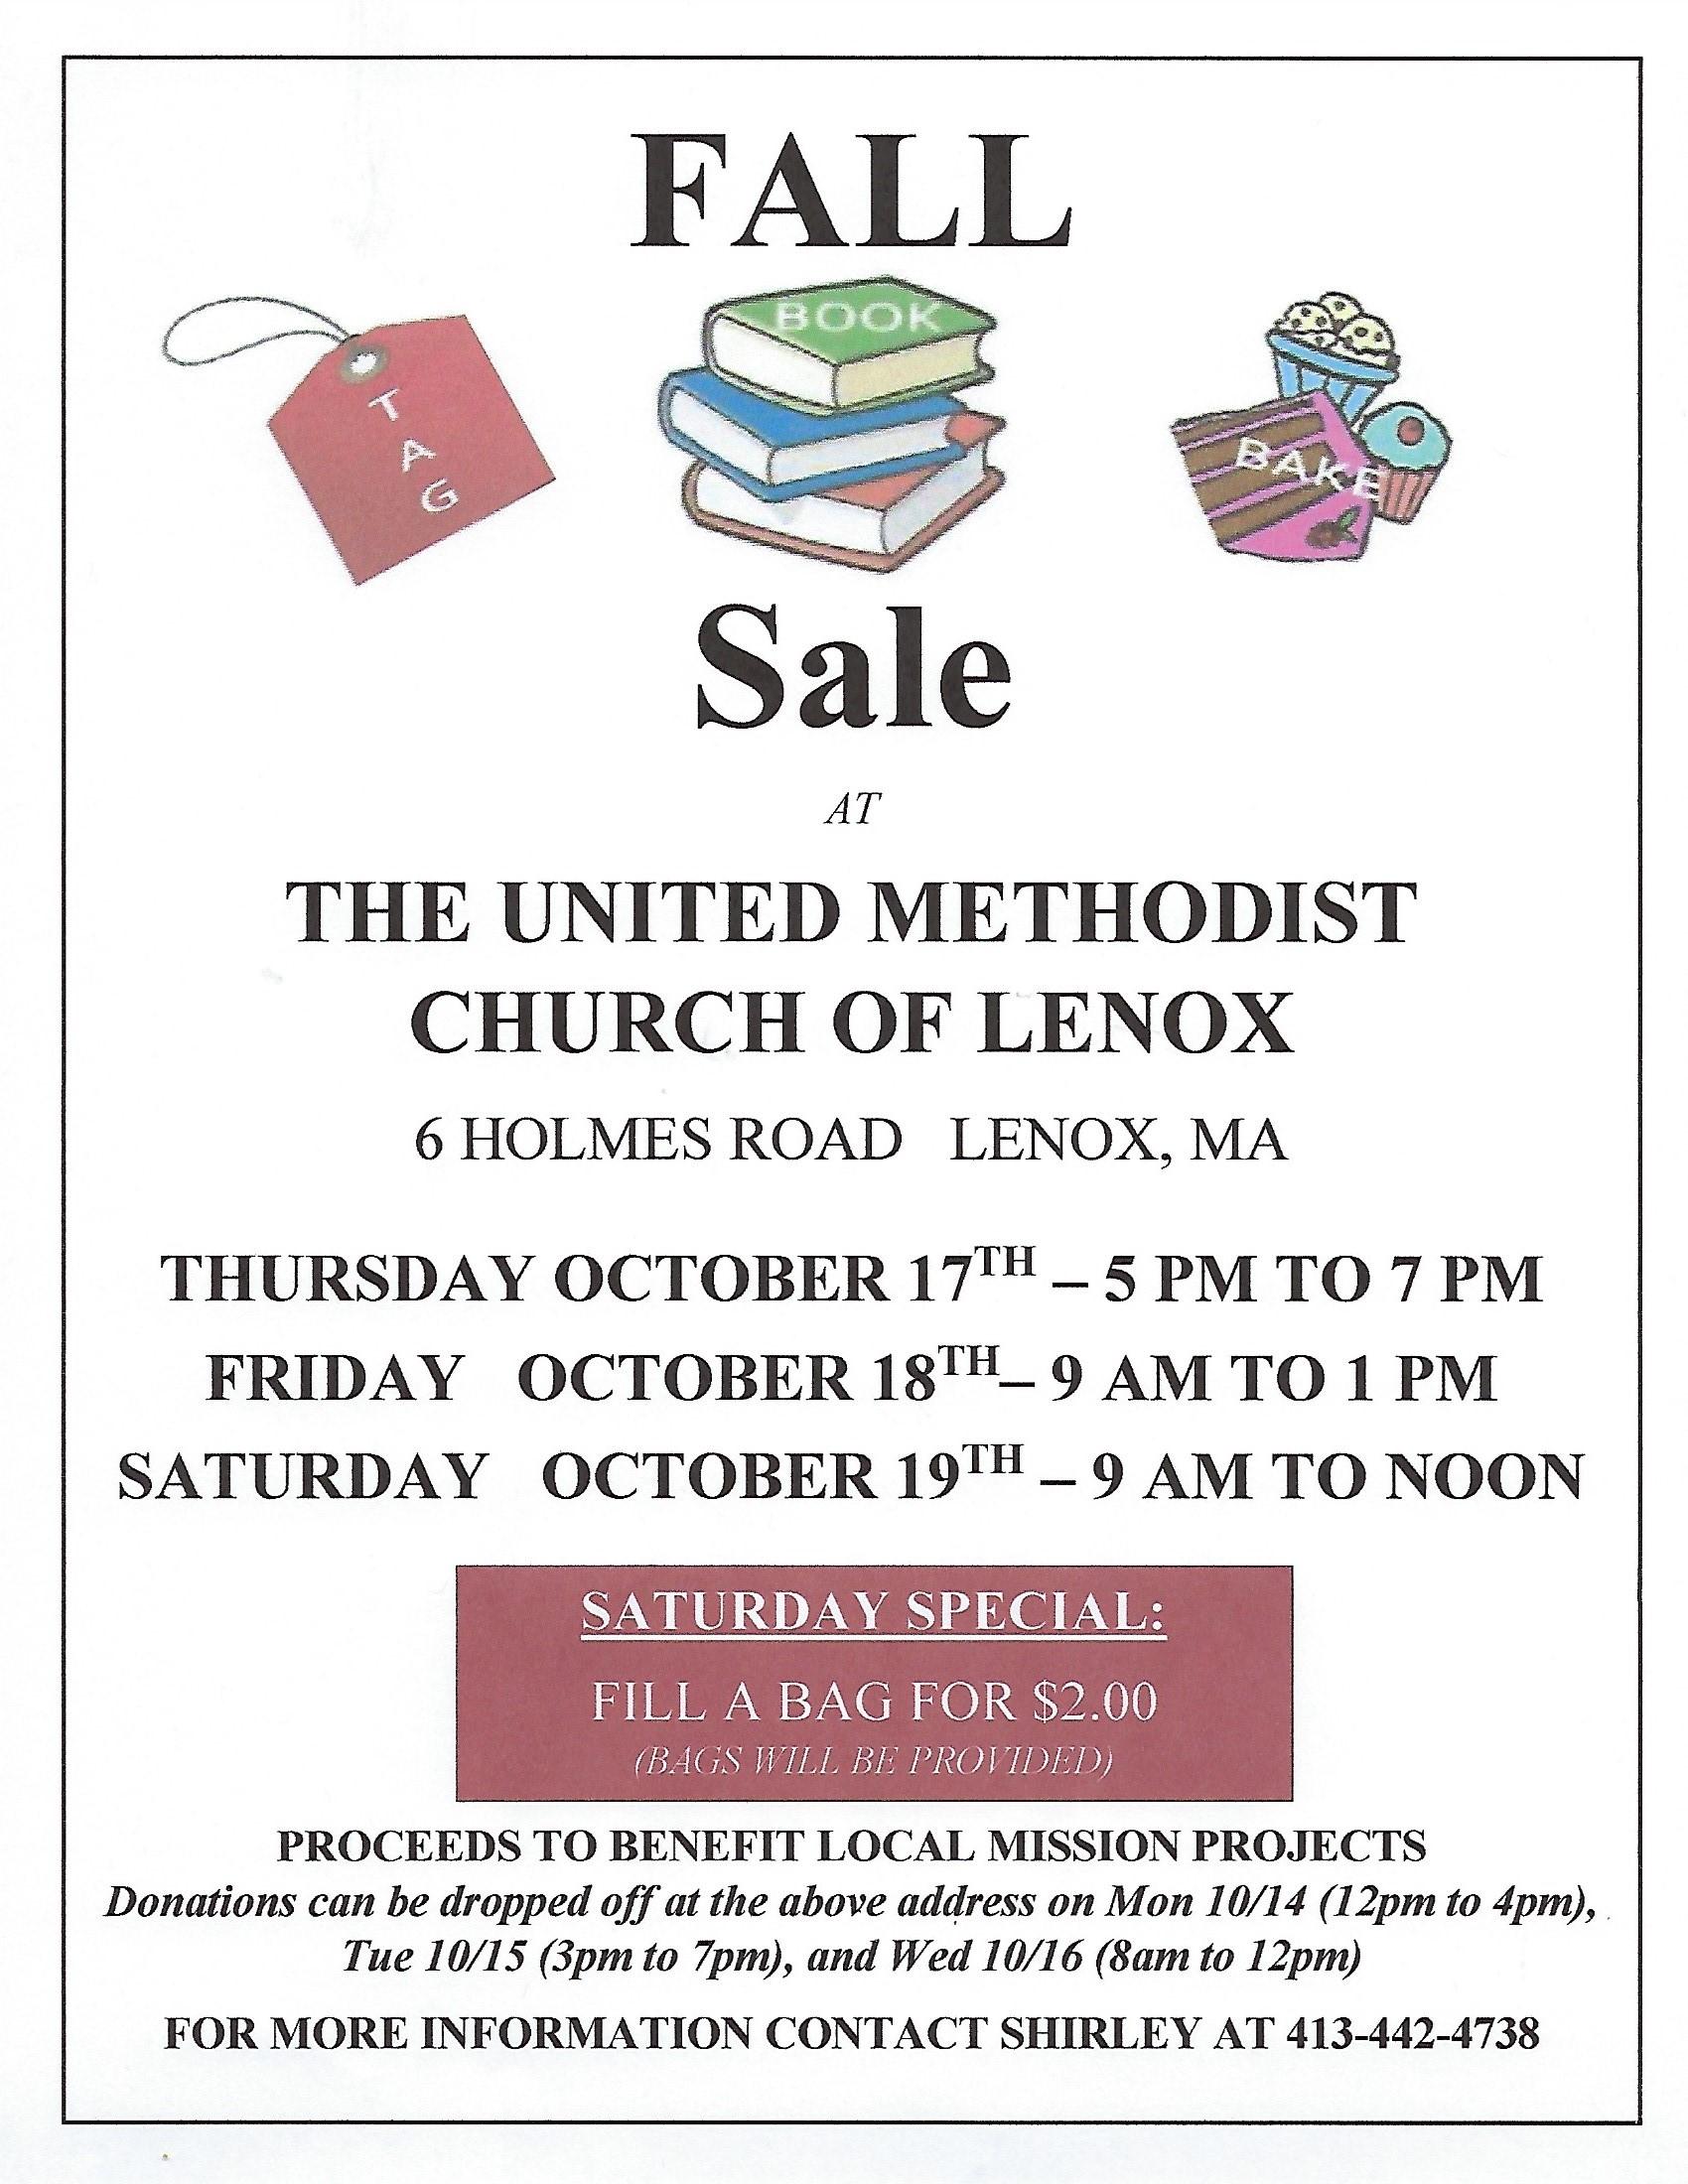 Fall Tag, Book & Bake Sale